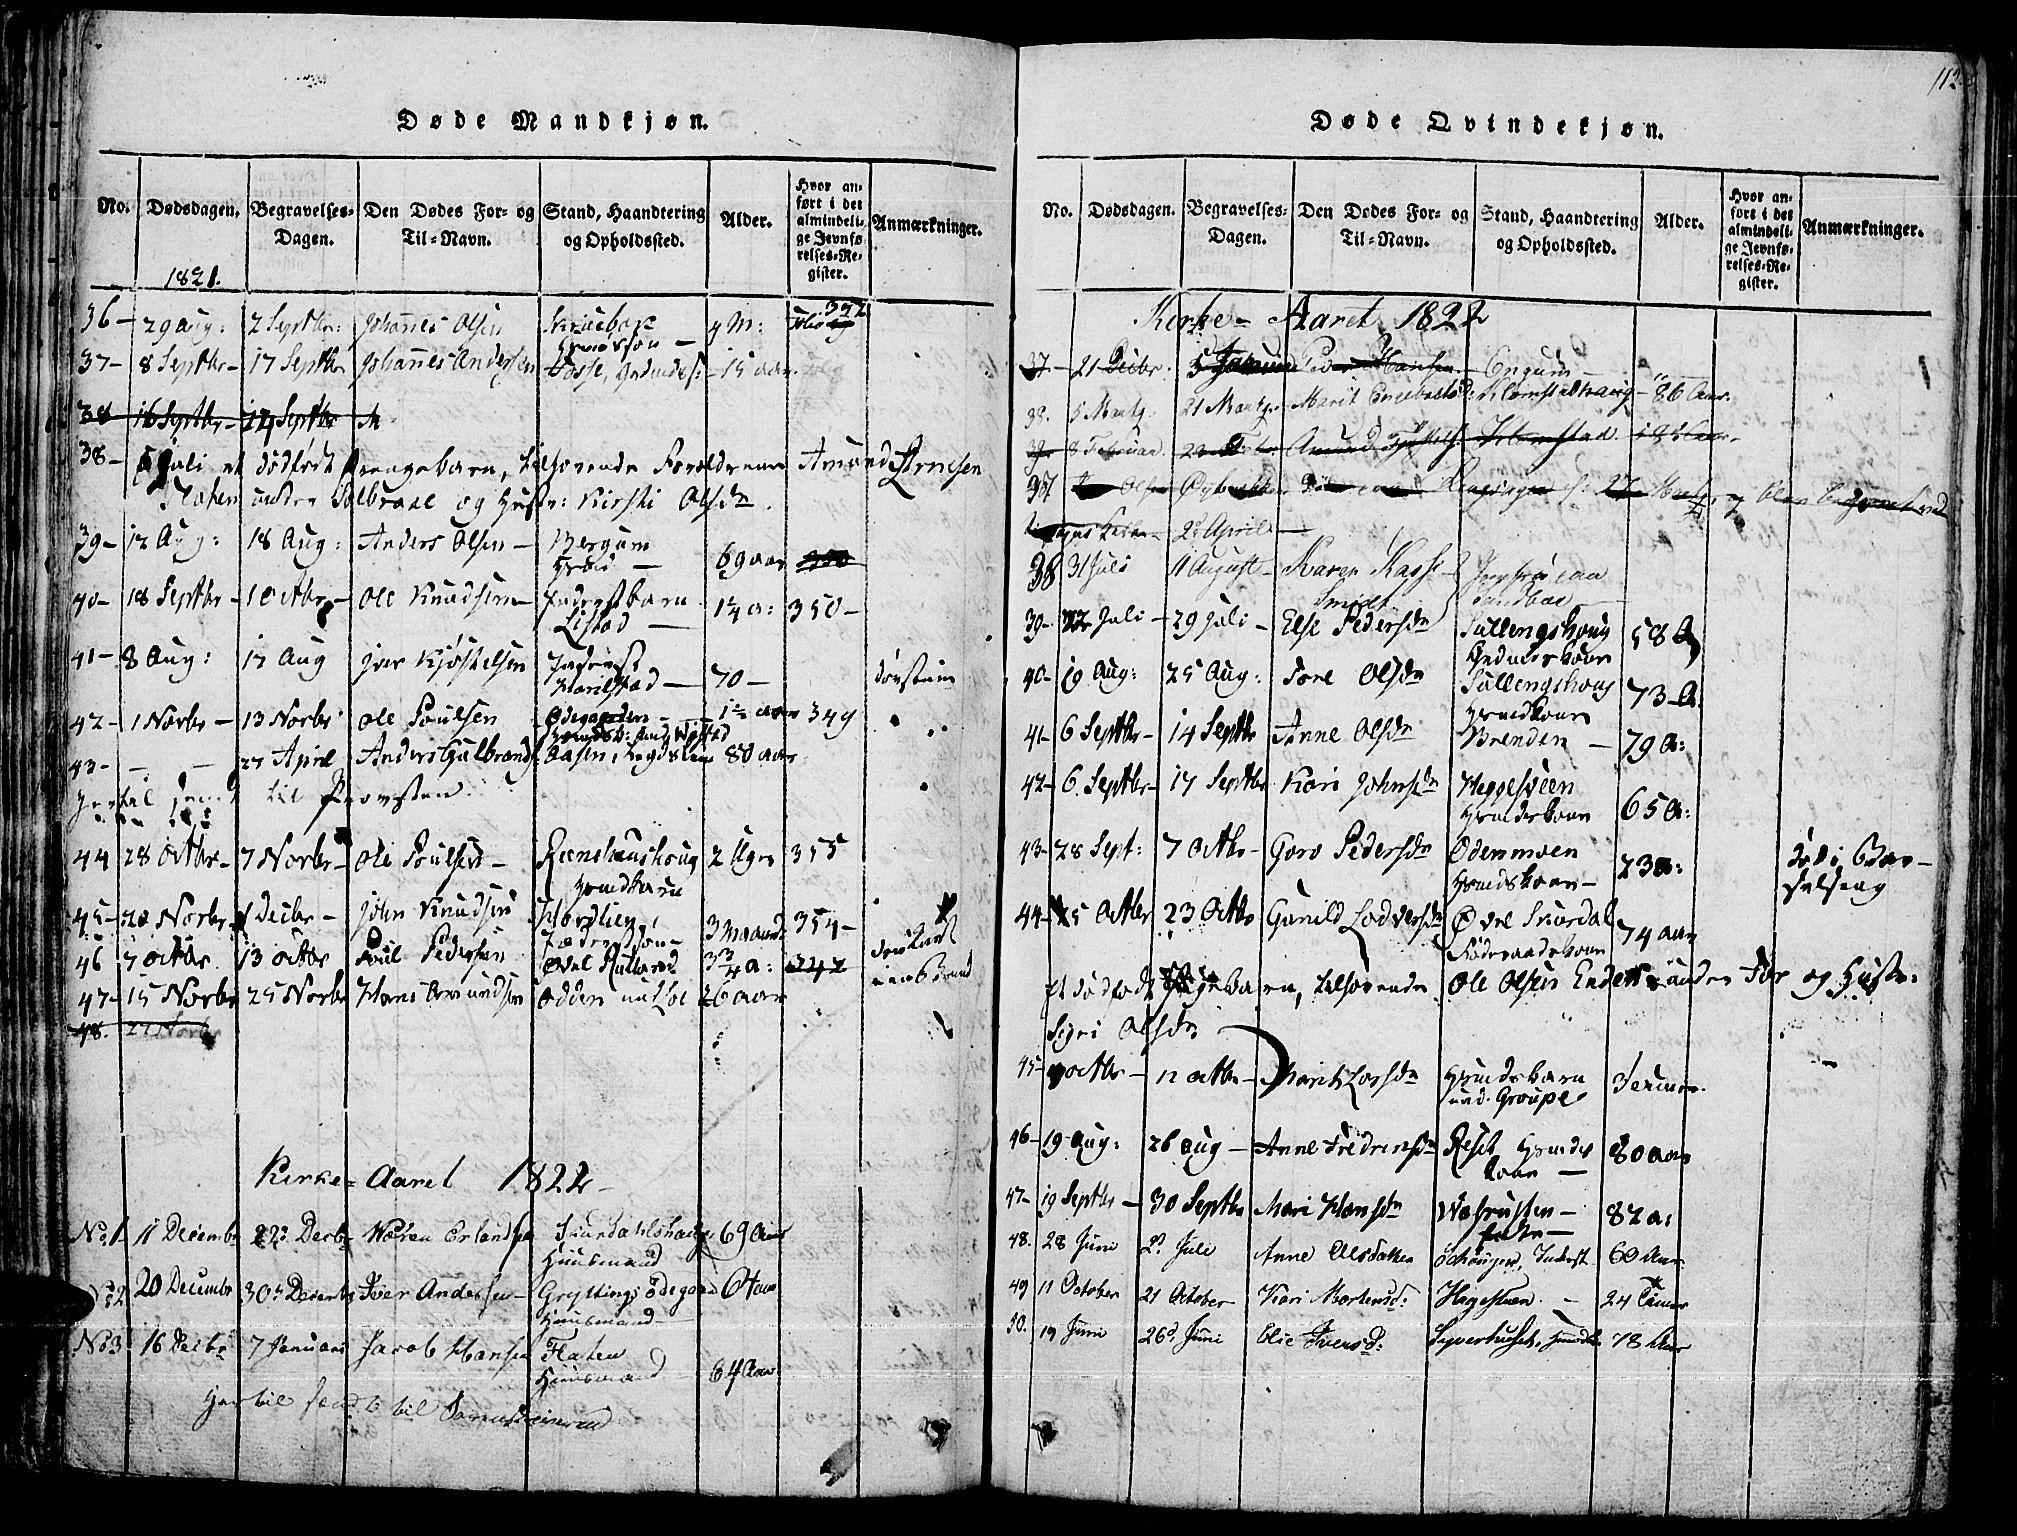 SAH, Fron prestekontor, H/Ha/Haa/L0002: Ministerialbok nr. 2, 1816-1827, s. 112